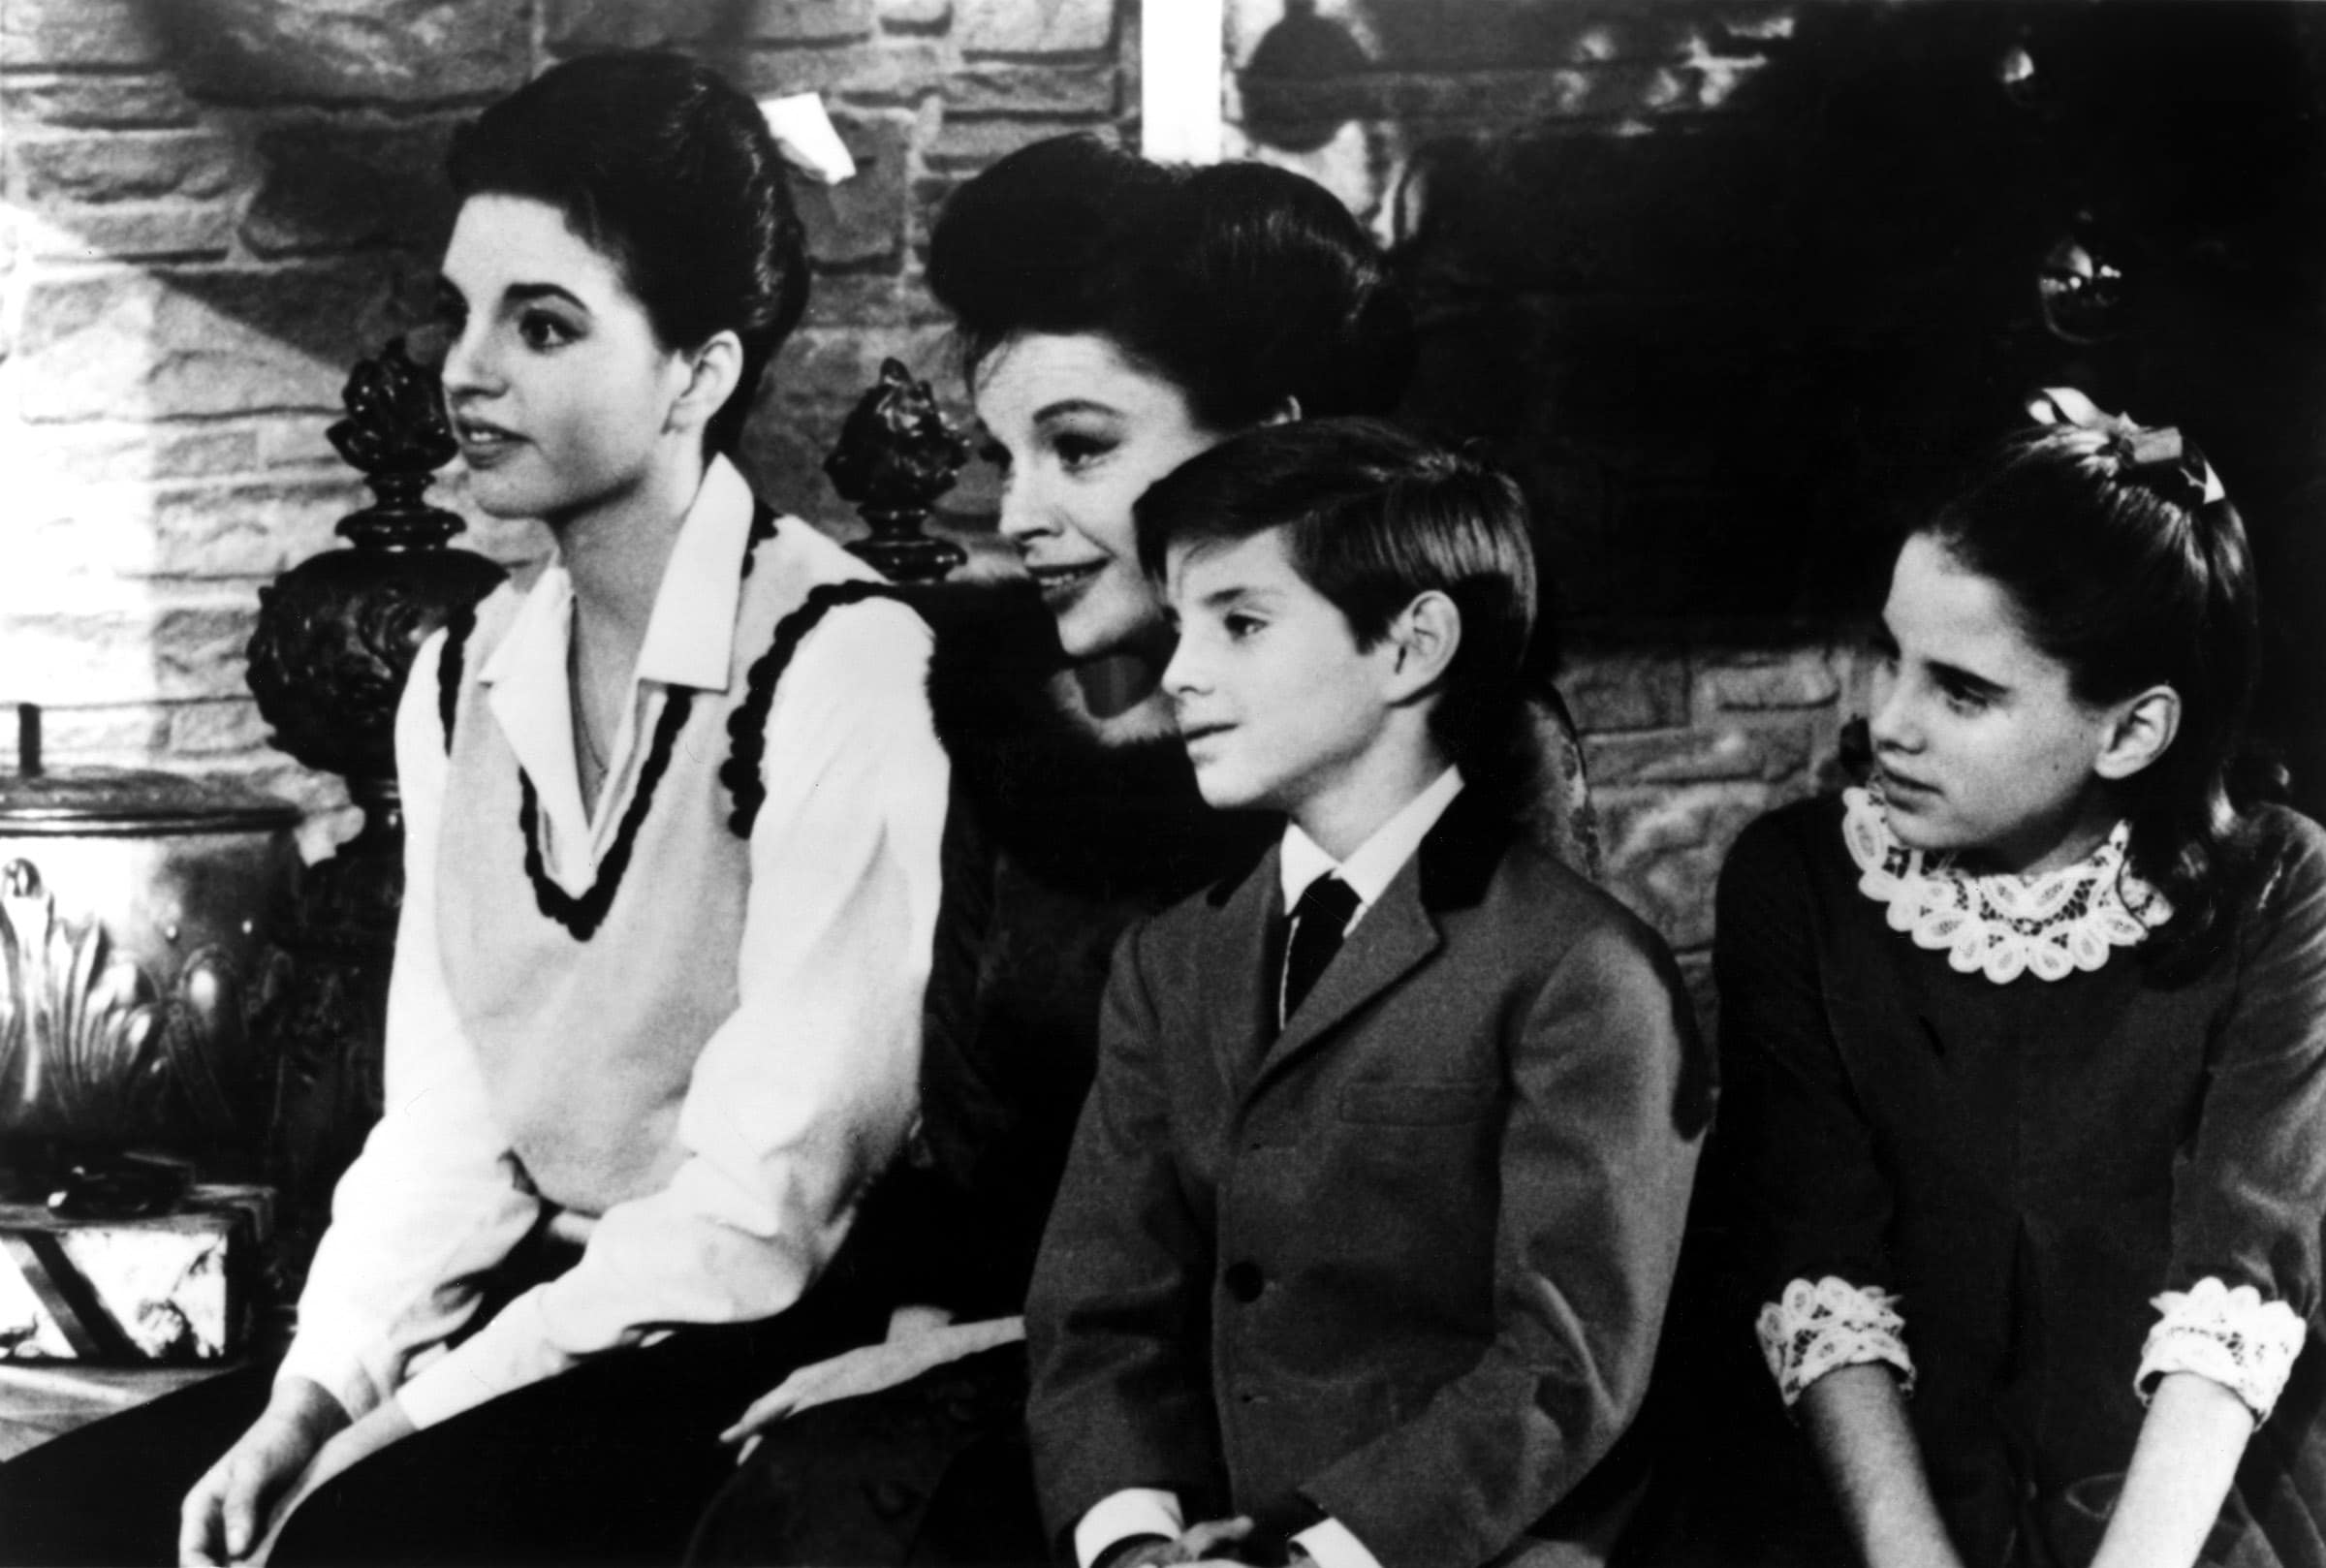 JUDY GARLAND SHOW, 1963-64, Liza Minnelli, Judy Garland, Joey Luft, Lorna Luft, 1963